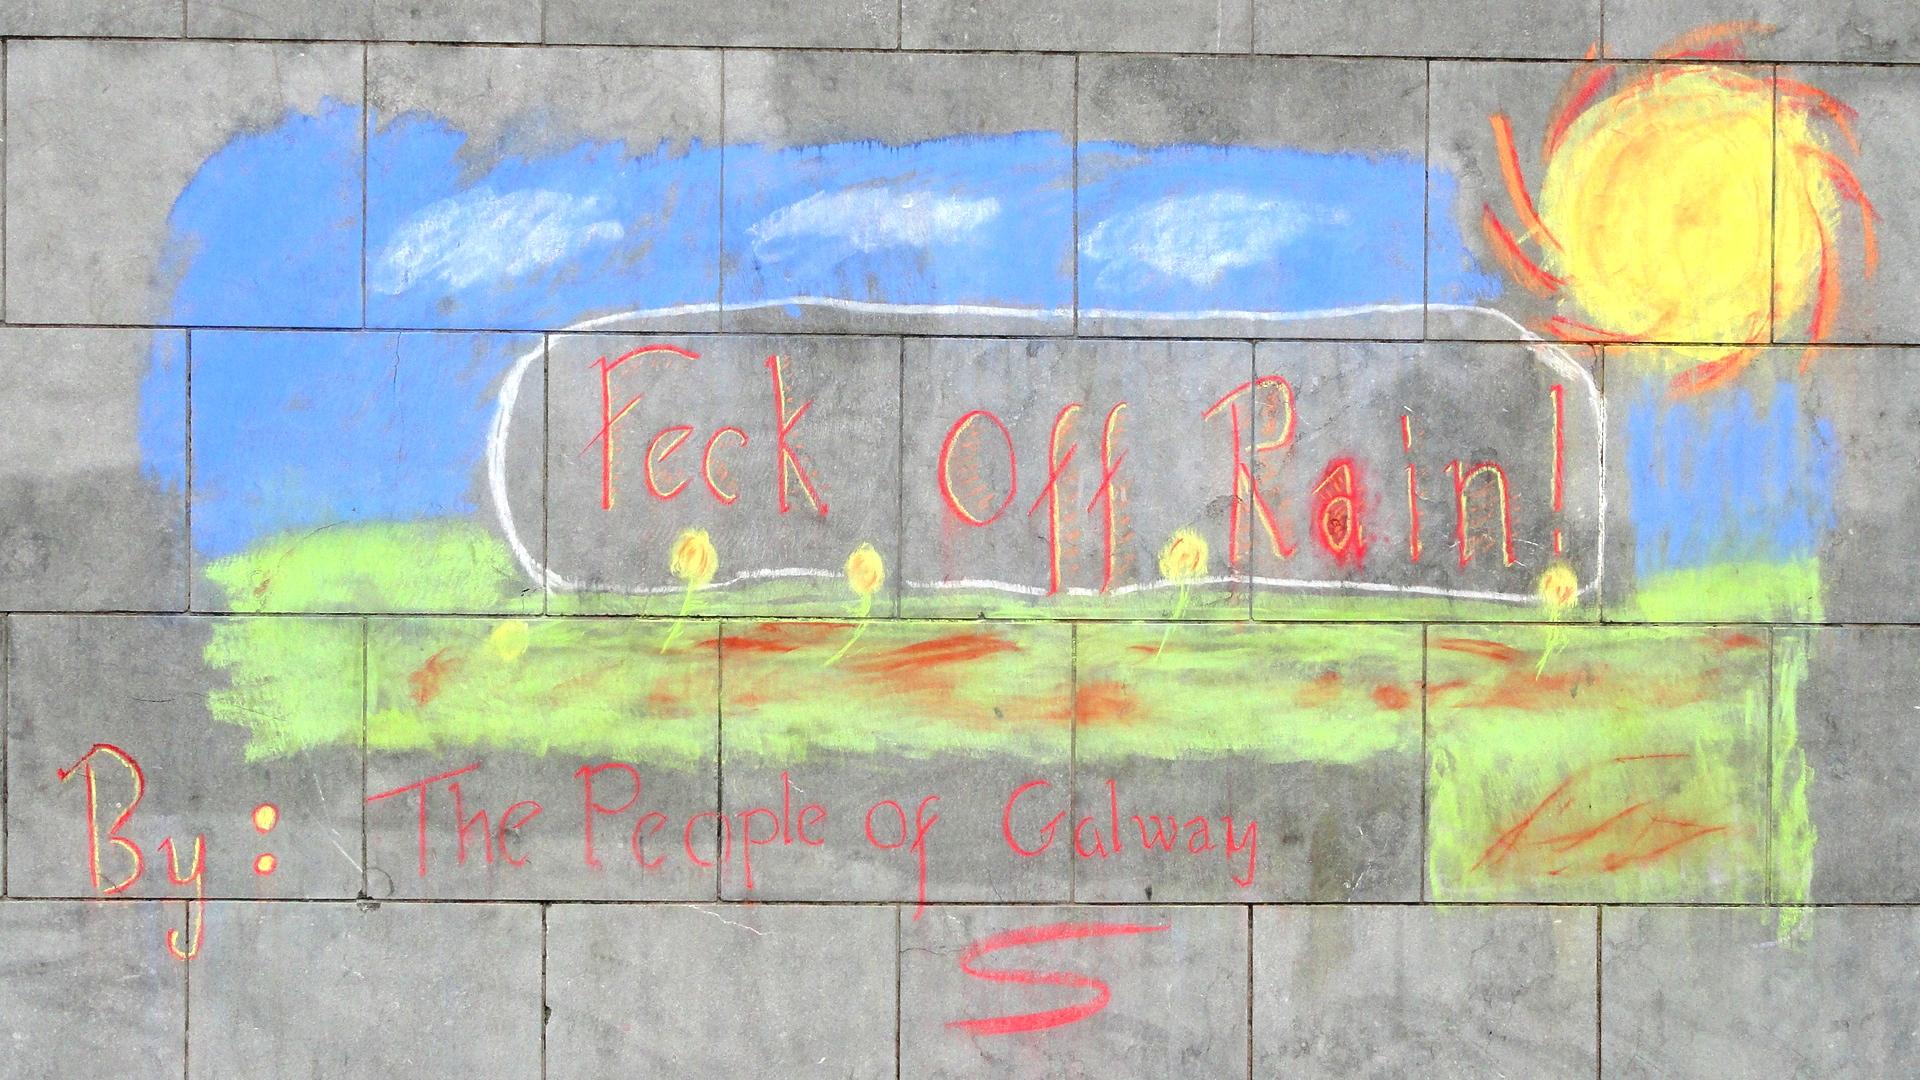 Galway -Fuck off Rain